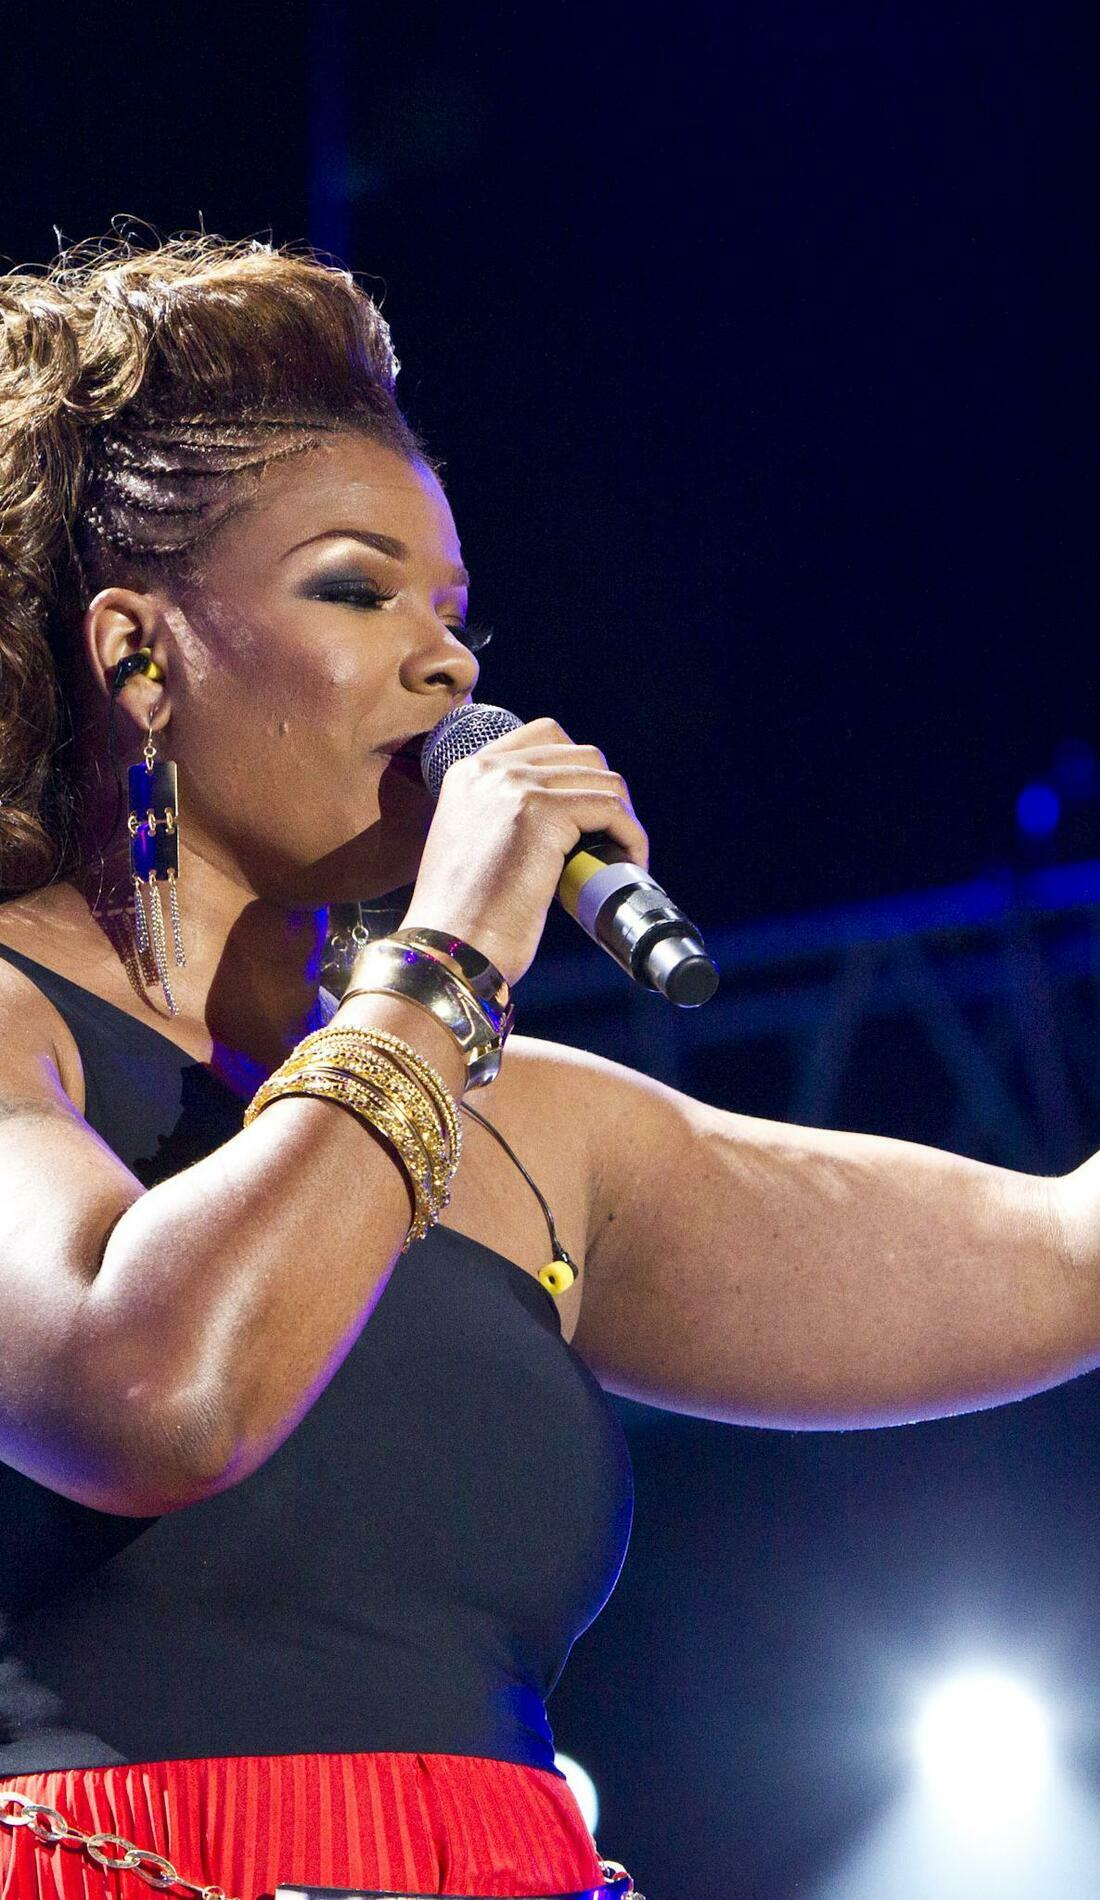 A Syleena Johnson live event